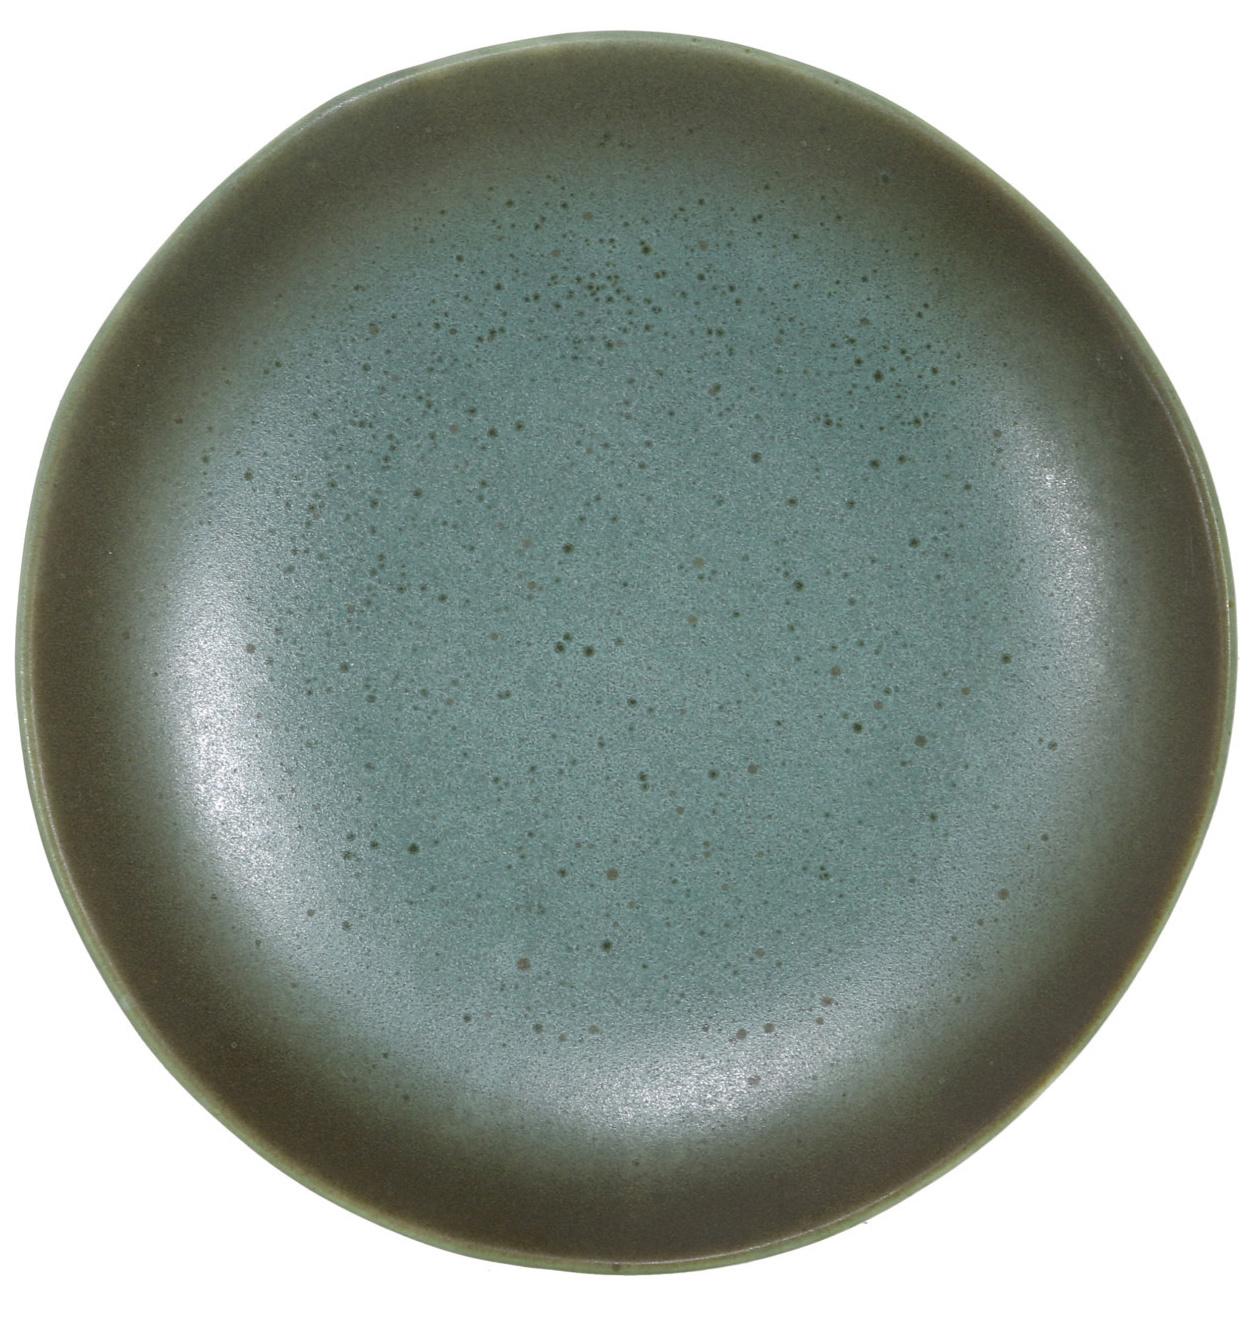 Bord dessert plate ceramic 70's moon-1